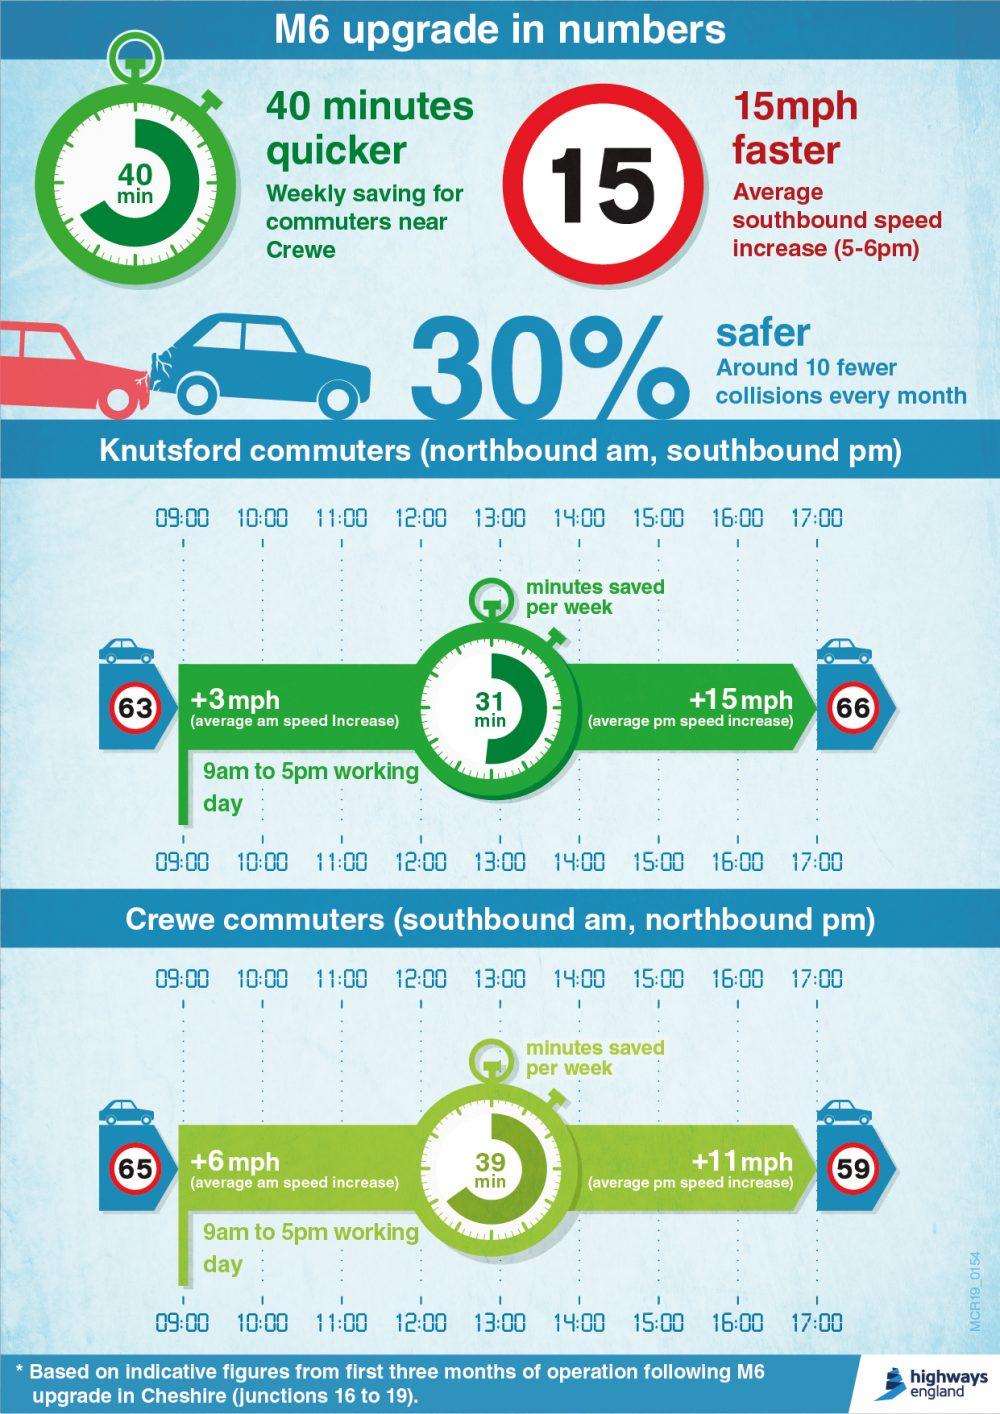 Extra Smart Motorway lanes are saving drivers 40 minutes each week